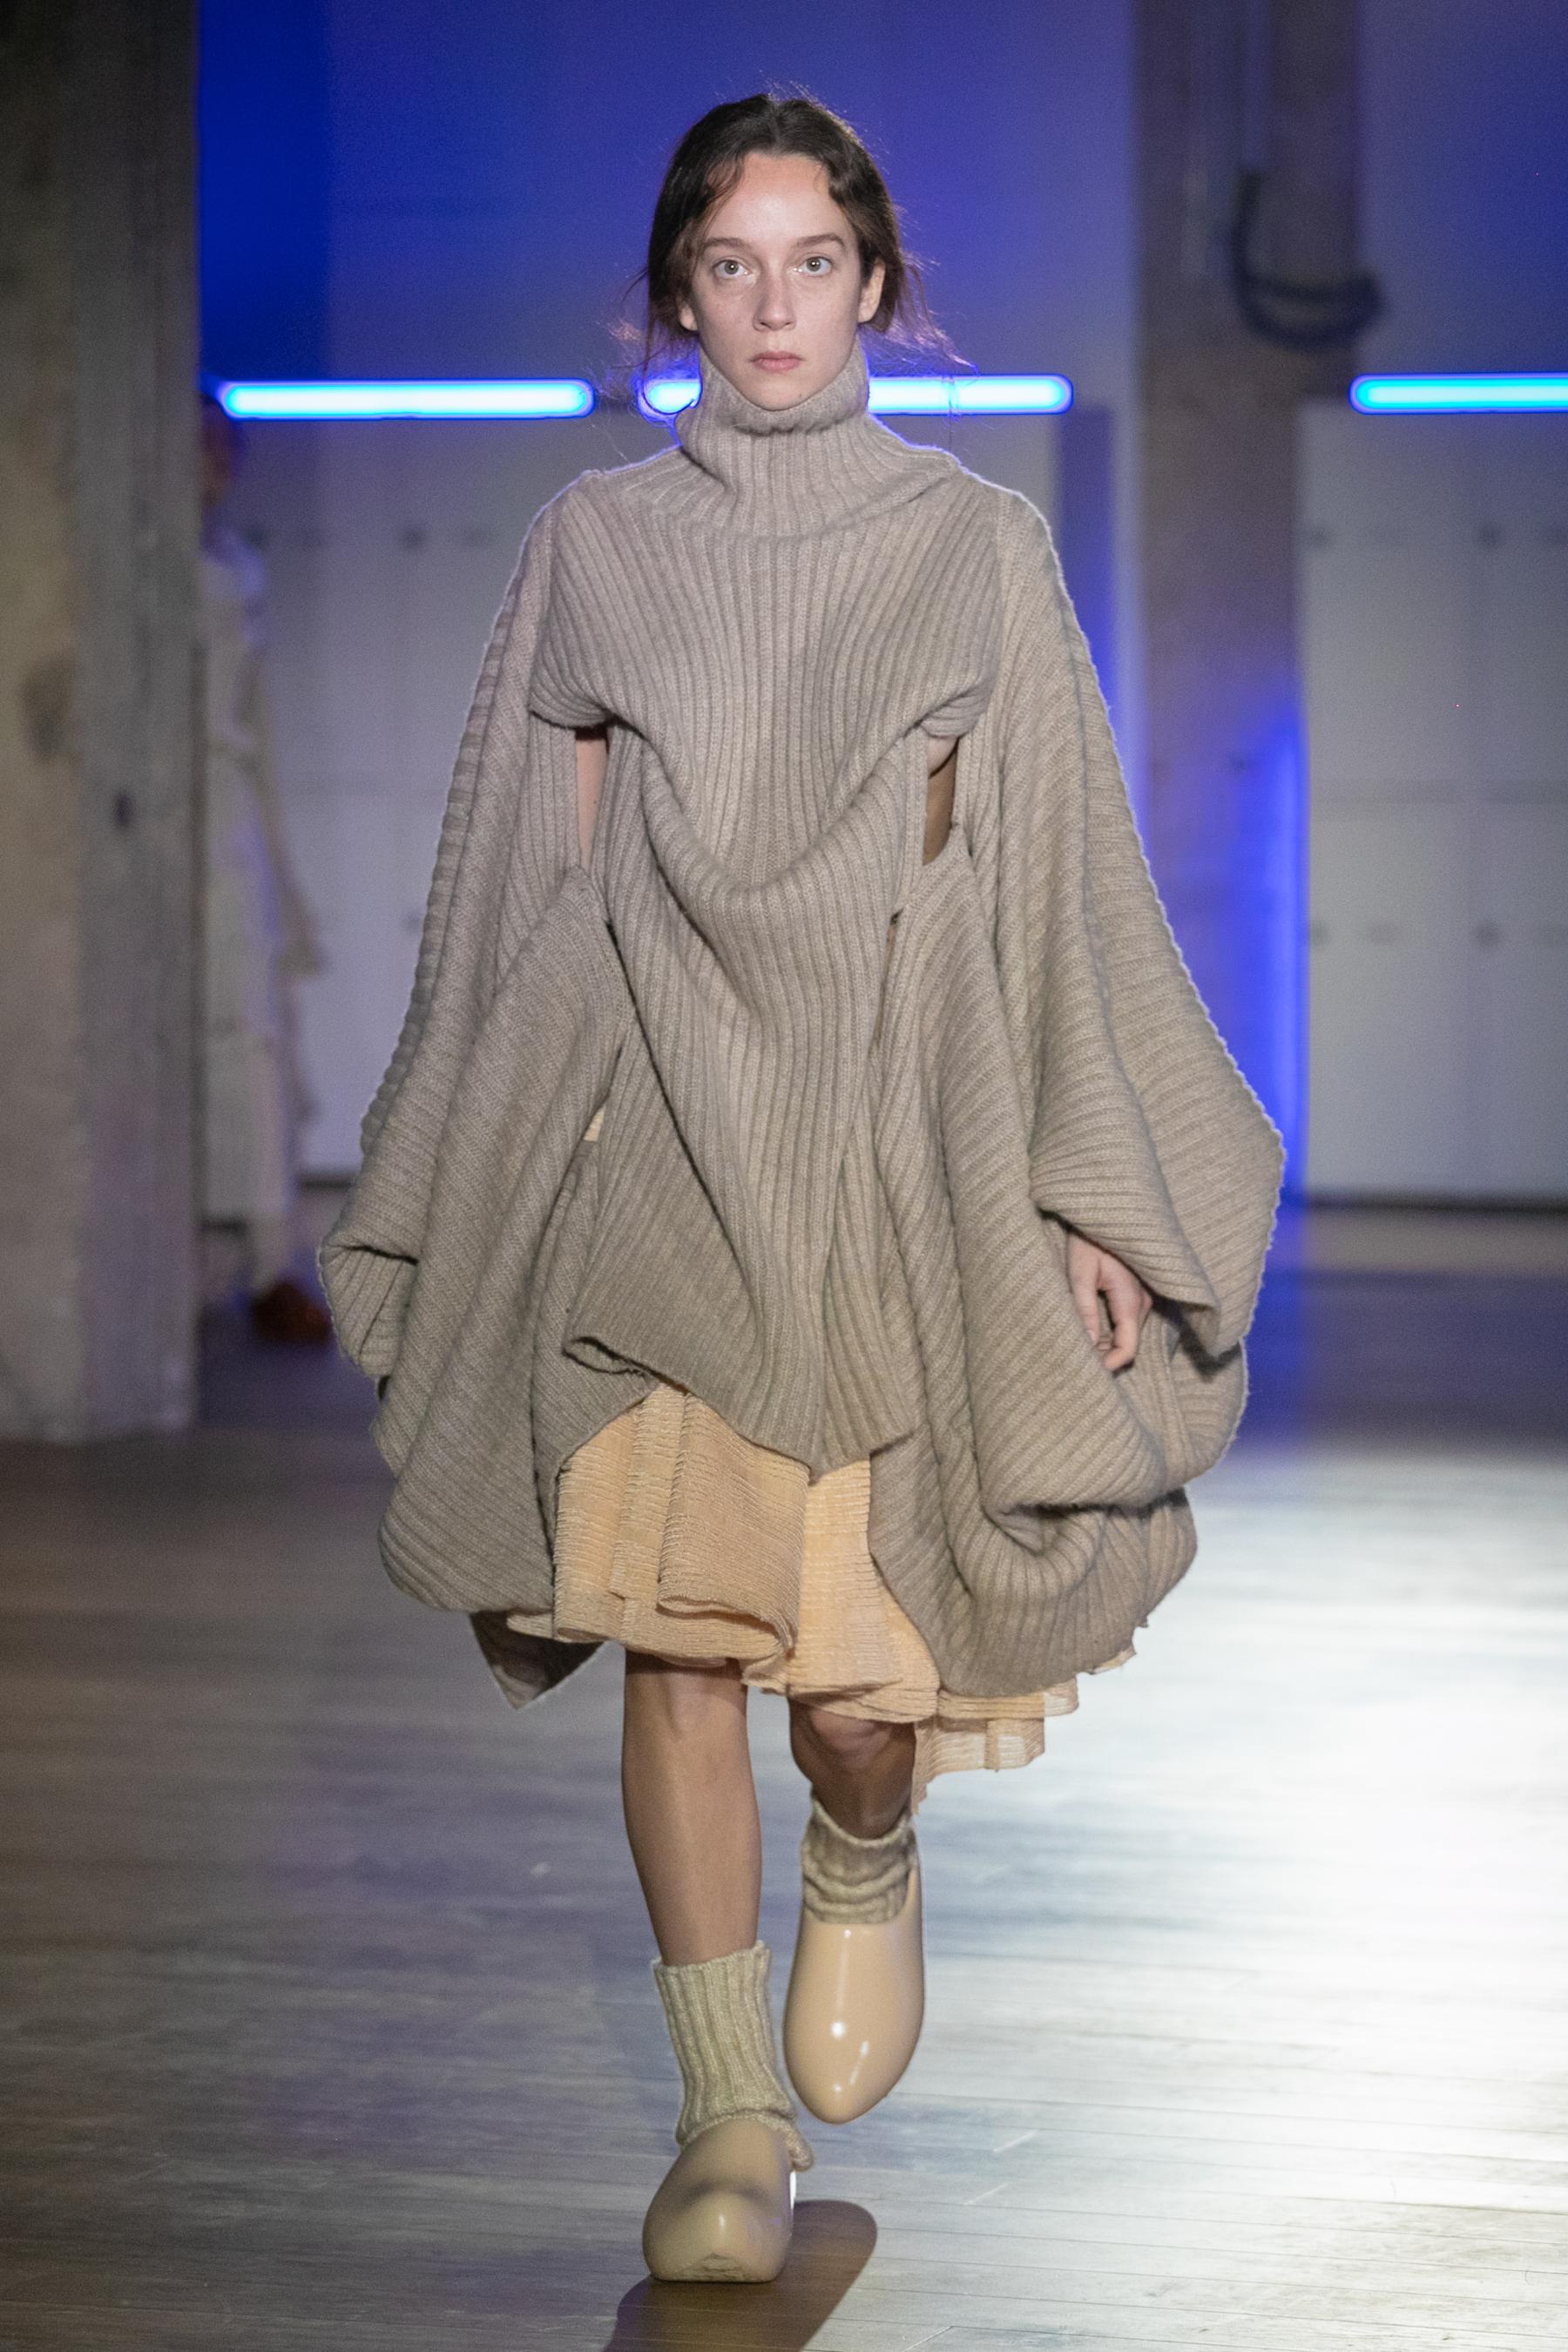 Institut Francais De La Mode Master Of Arts Fall 2021 Fashion Show